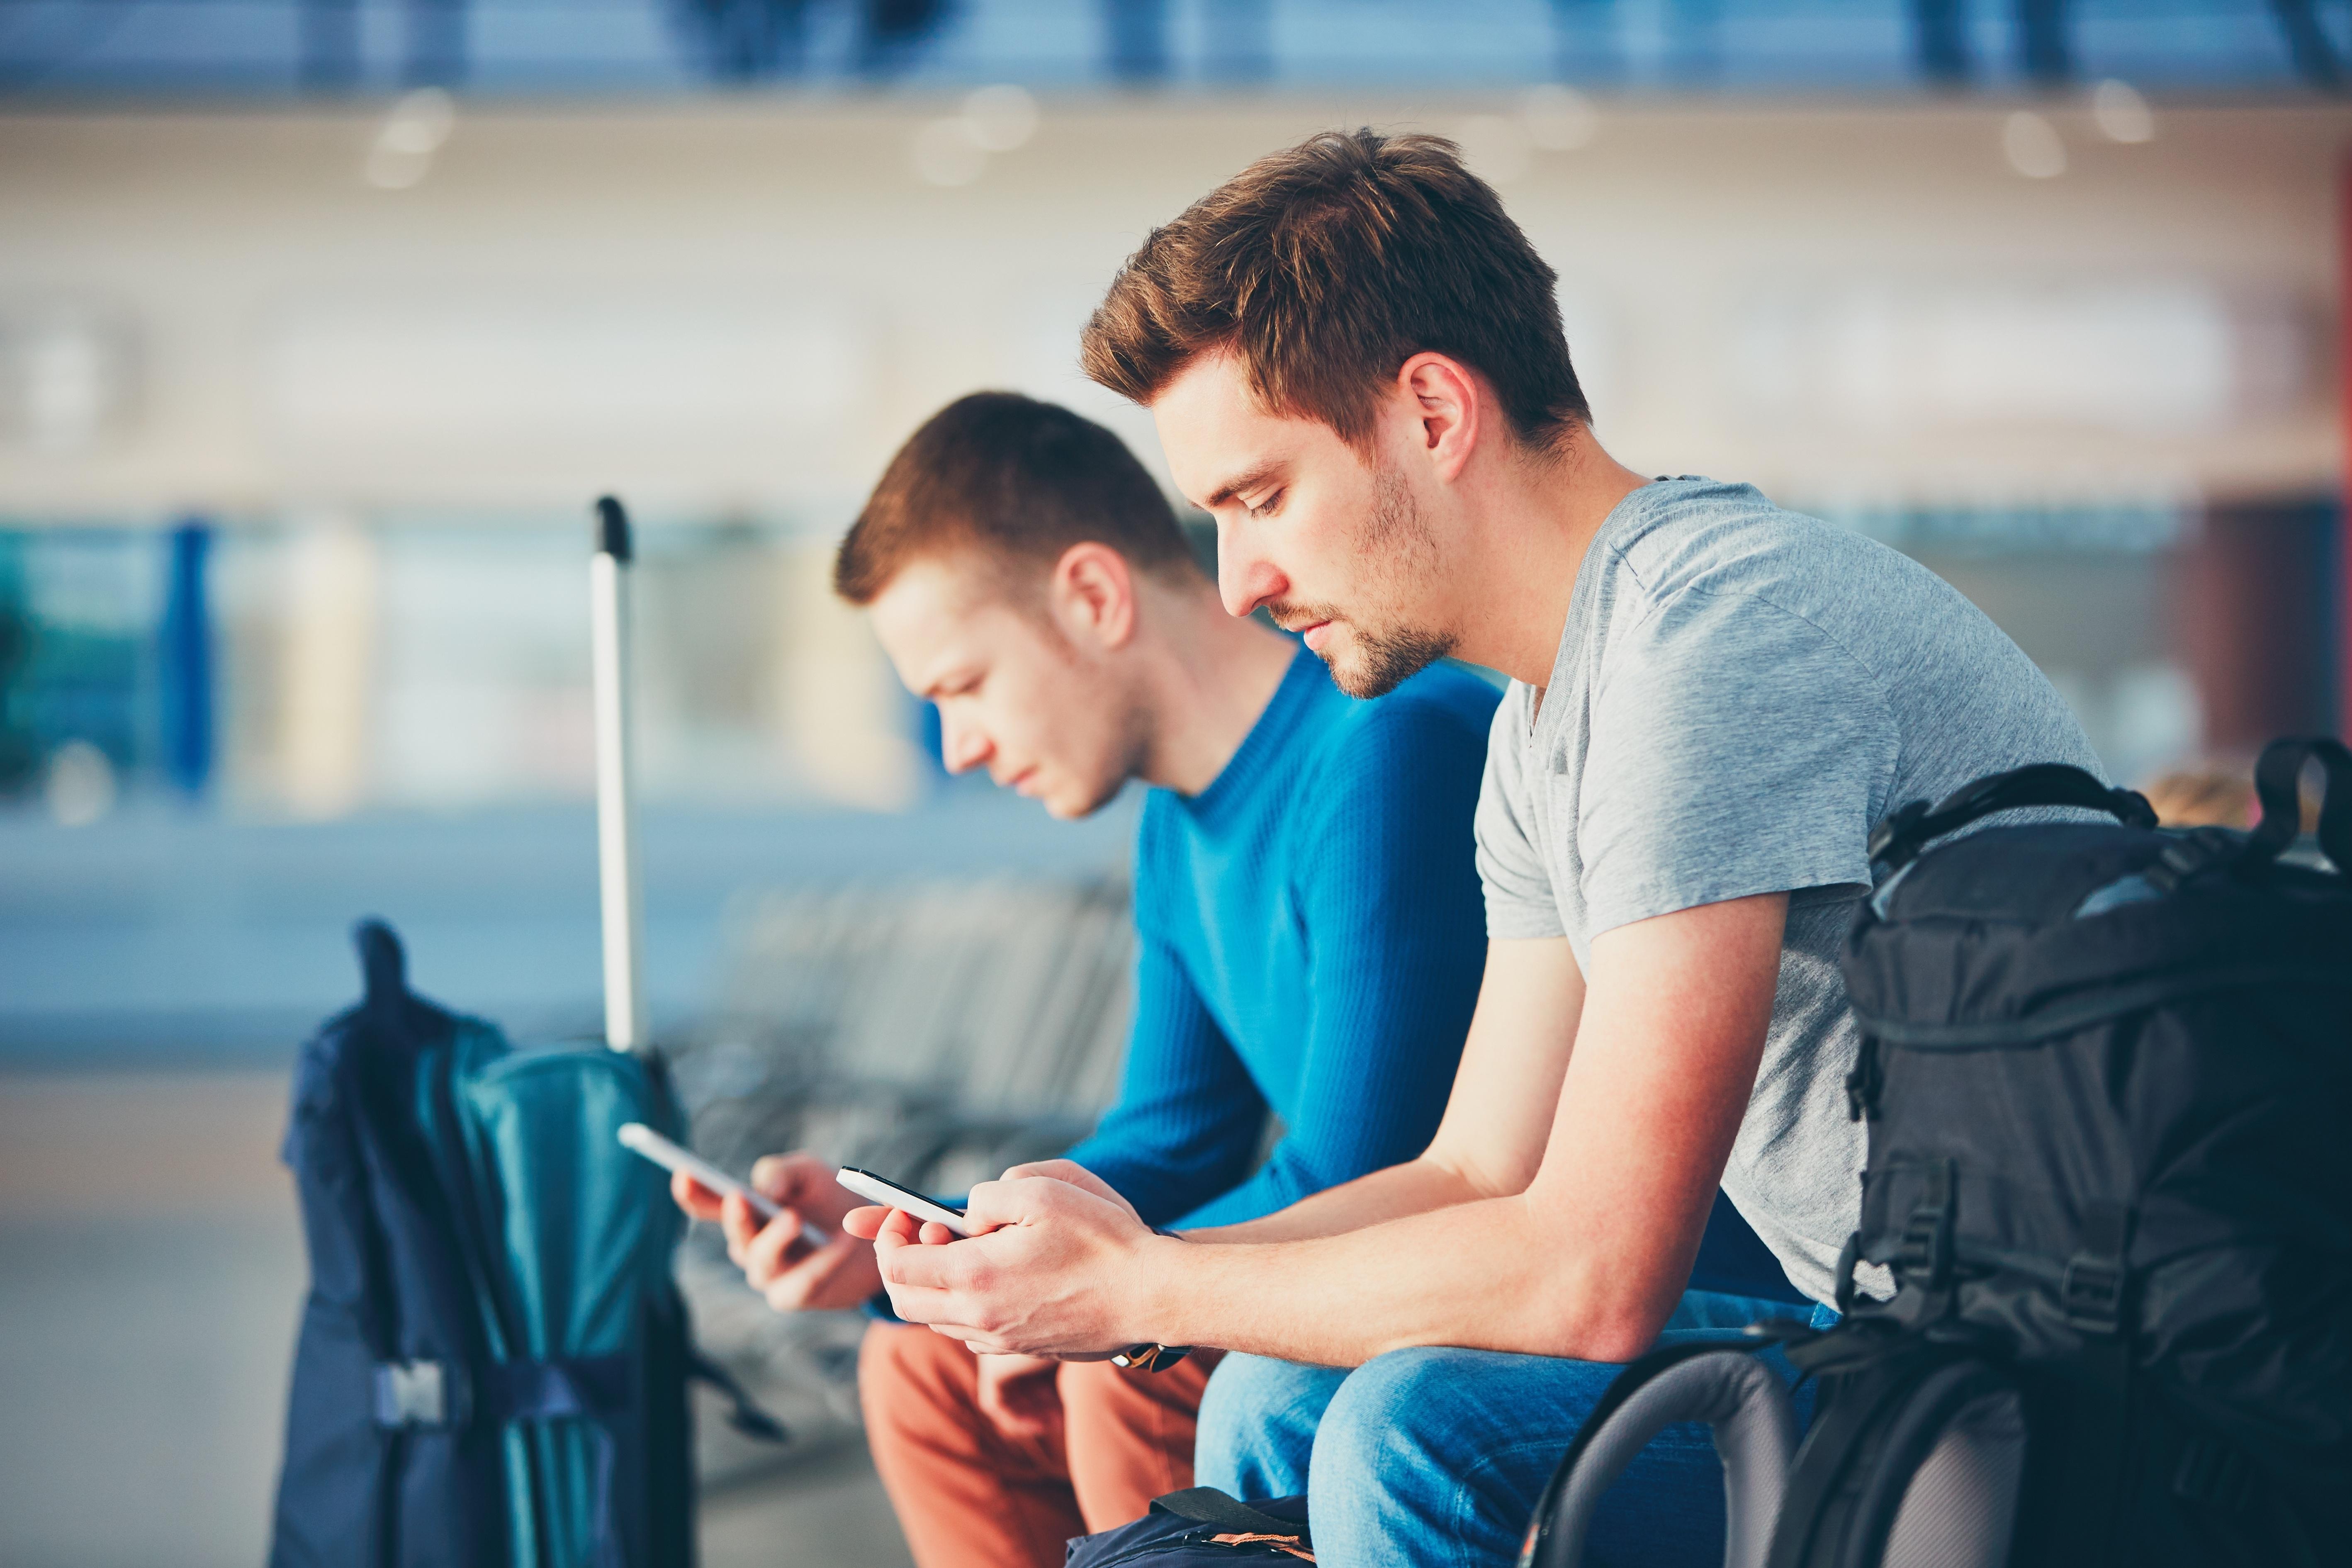 5 Ways to Win Traveler Loyalty in the Digital Era